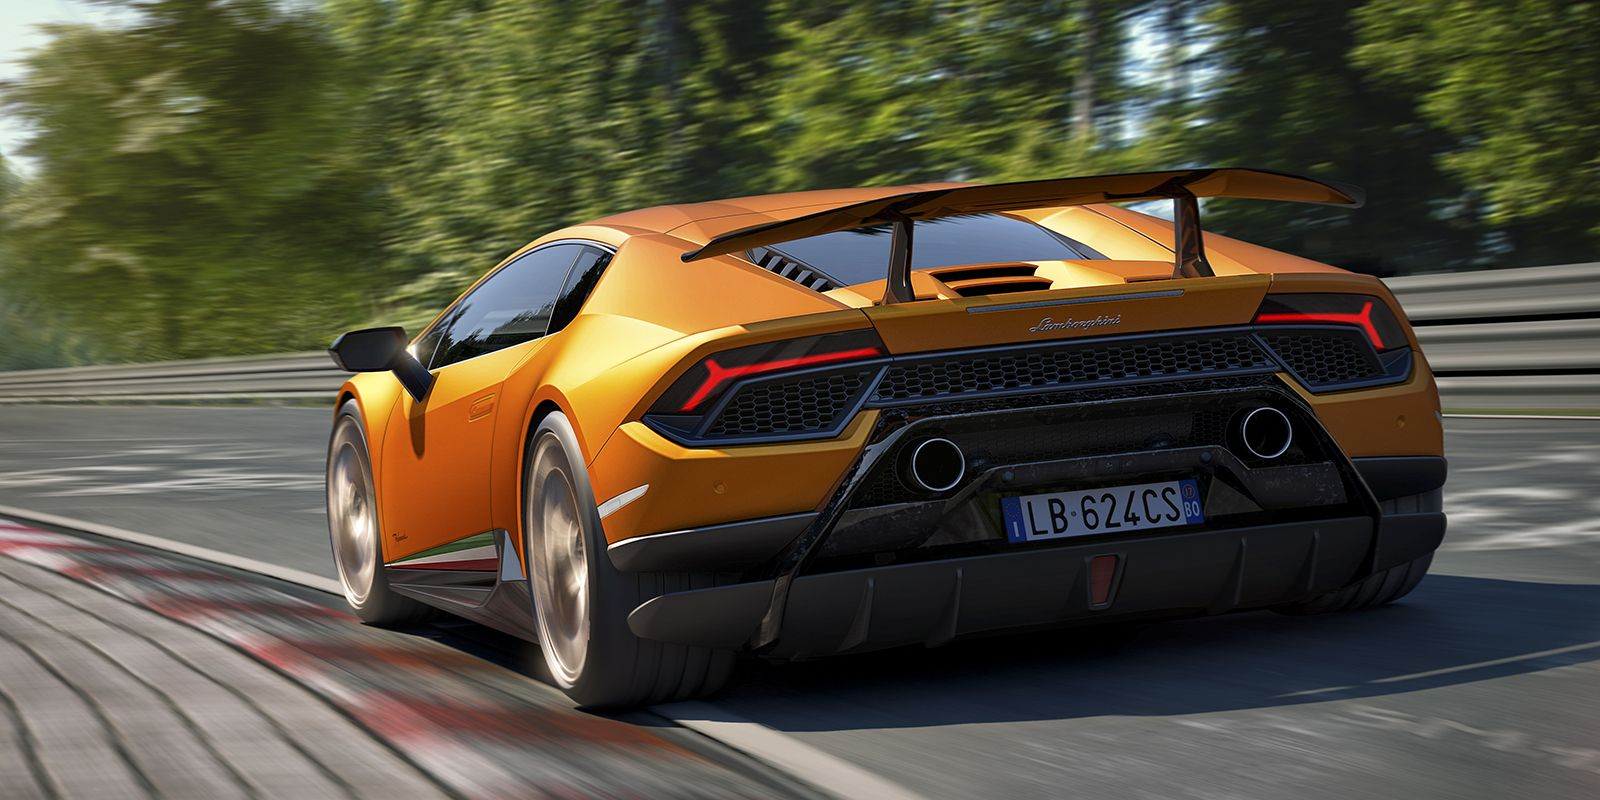 How The Lamborghini Huracan Performante Shaped The Air To Dominate